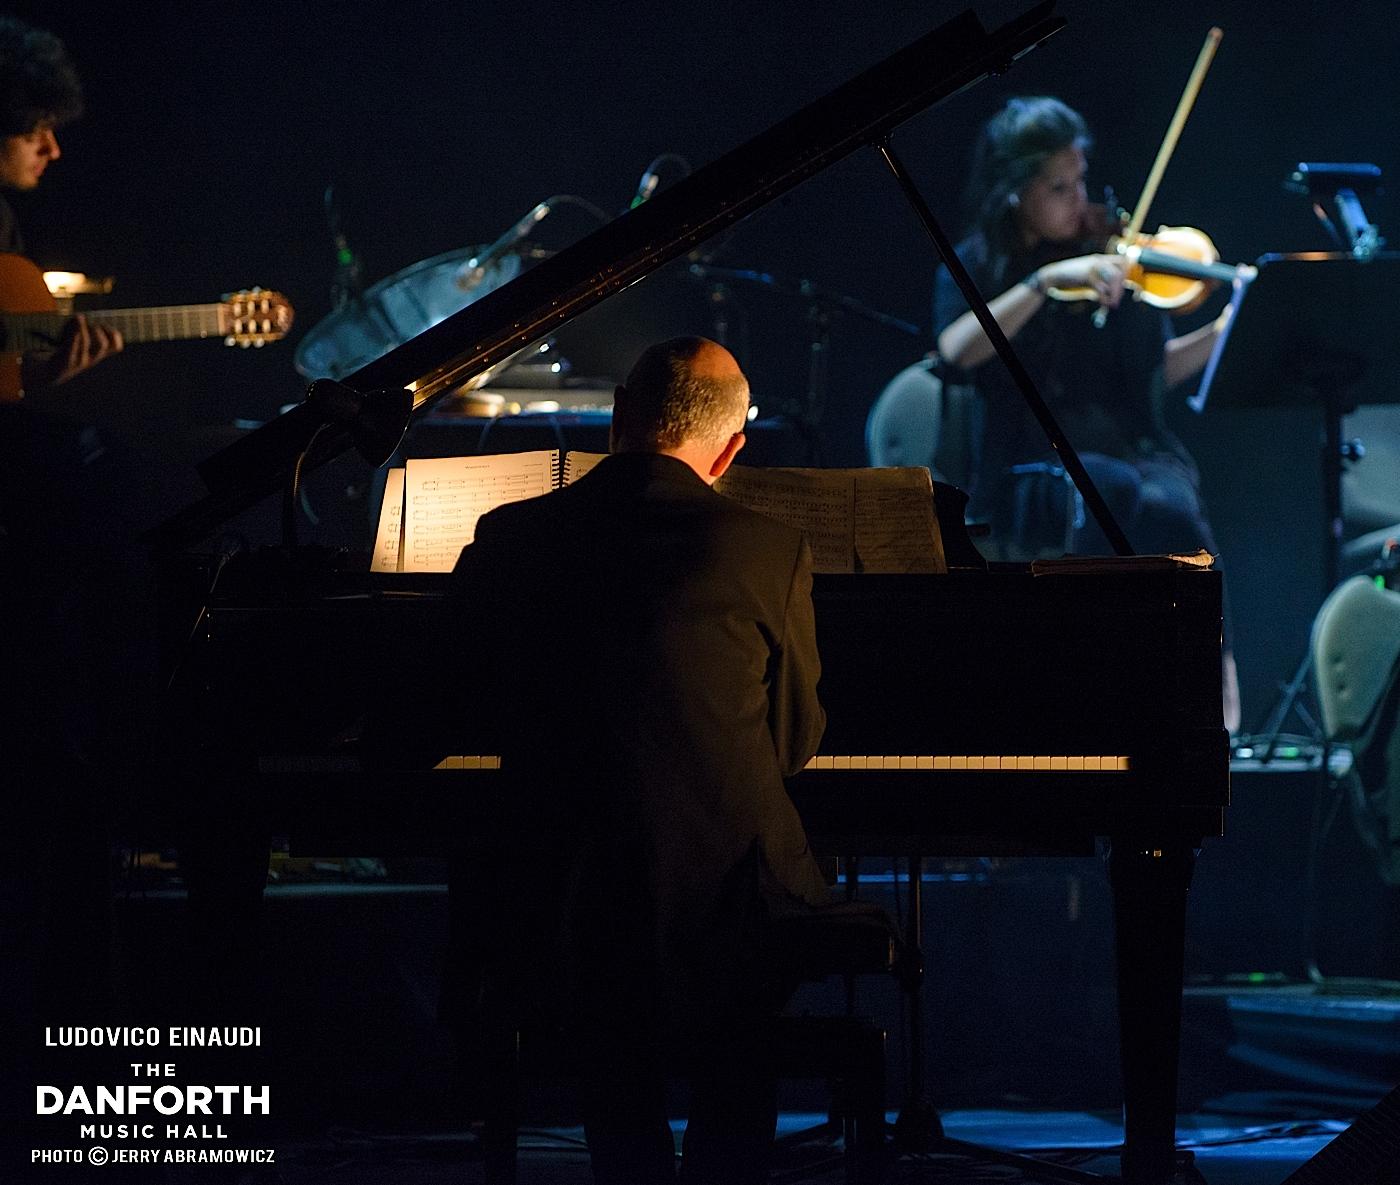 20130517 Ludovico Einaudi performs at The Danforth Music Hall Toronto 0114